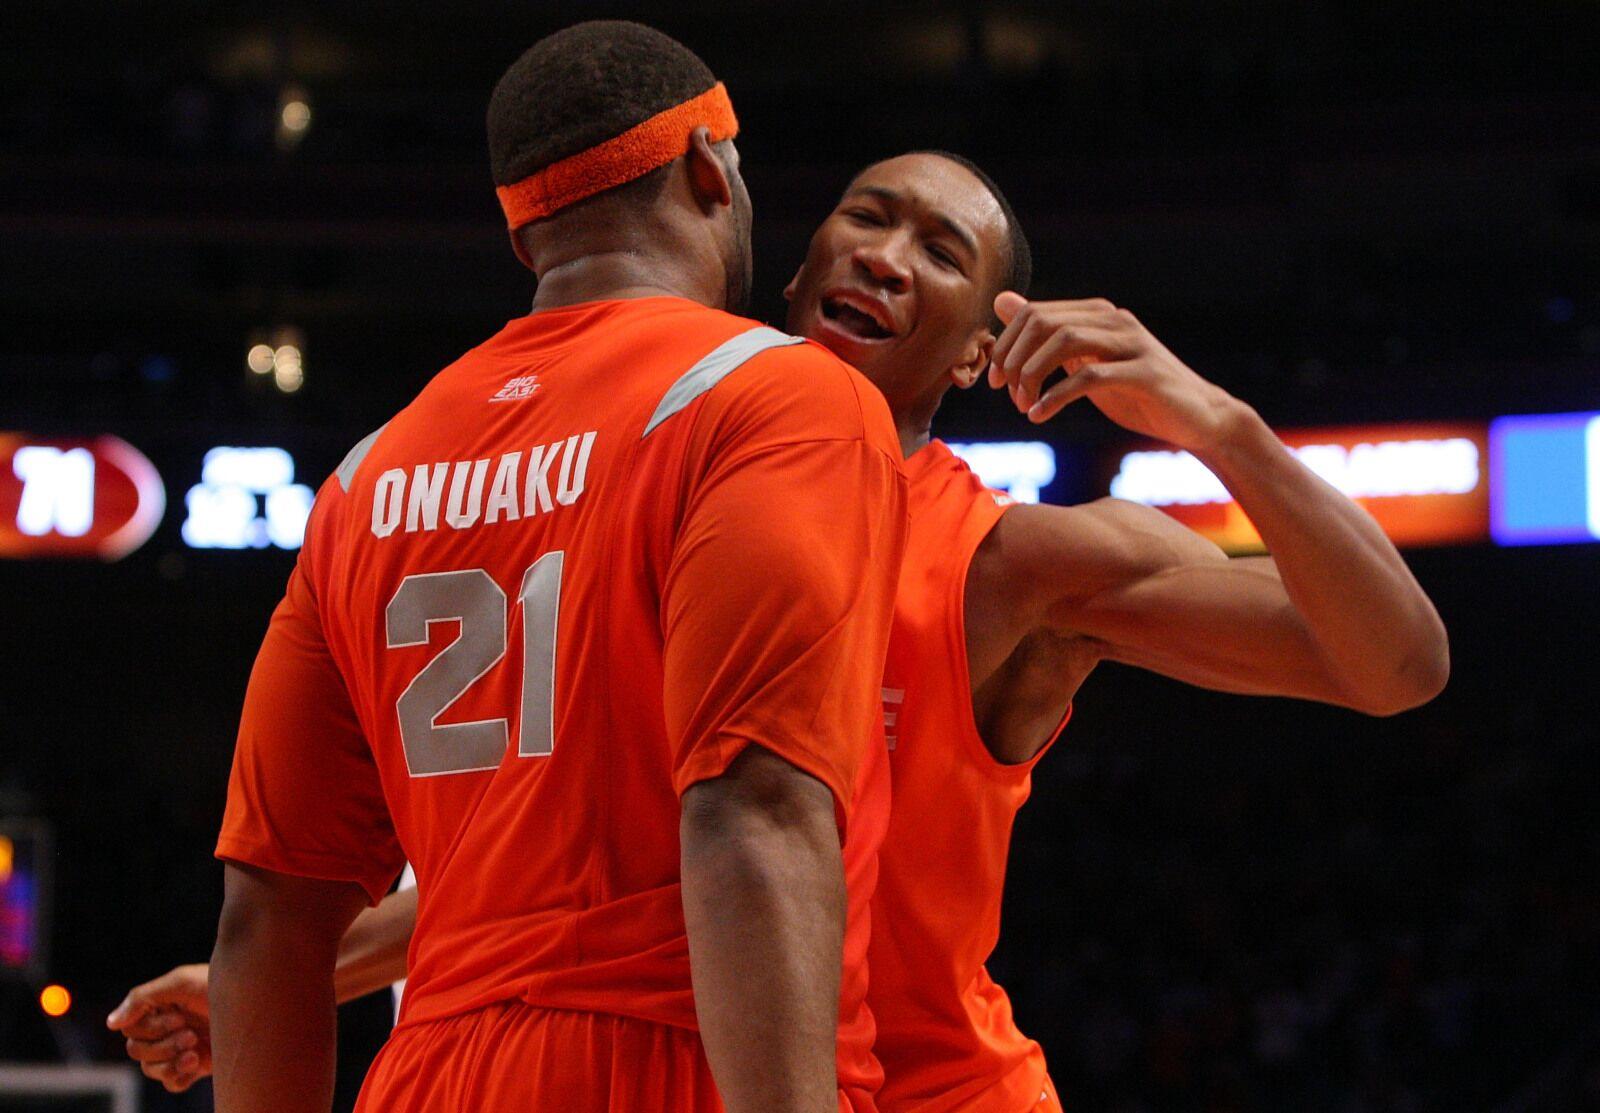 Syracuse Basketball: Boeheim's Army selects Arinze Onuaku, Jordan Crawford